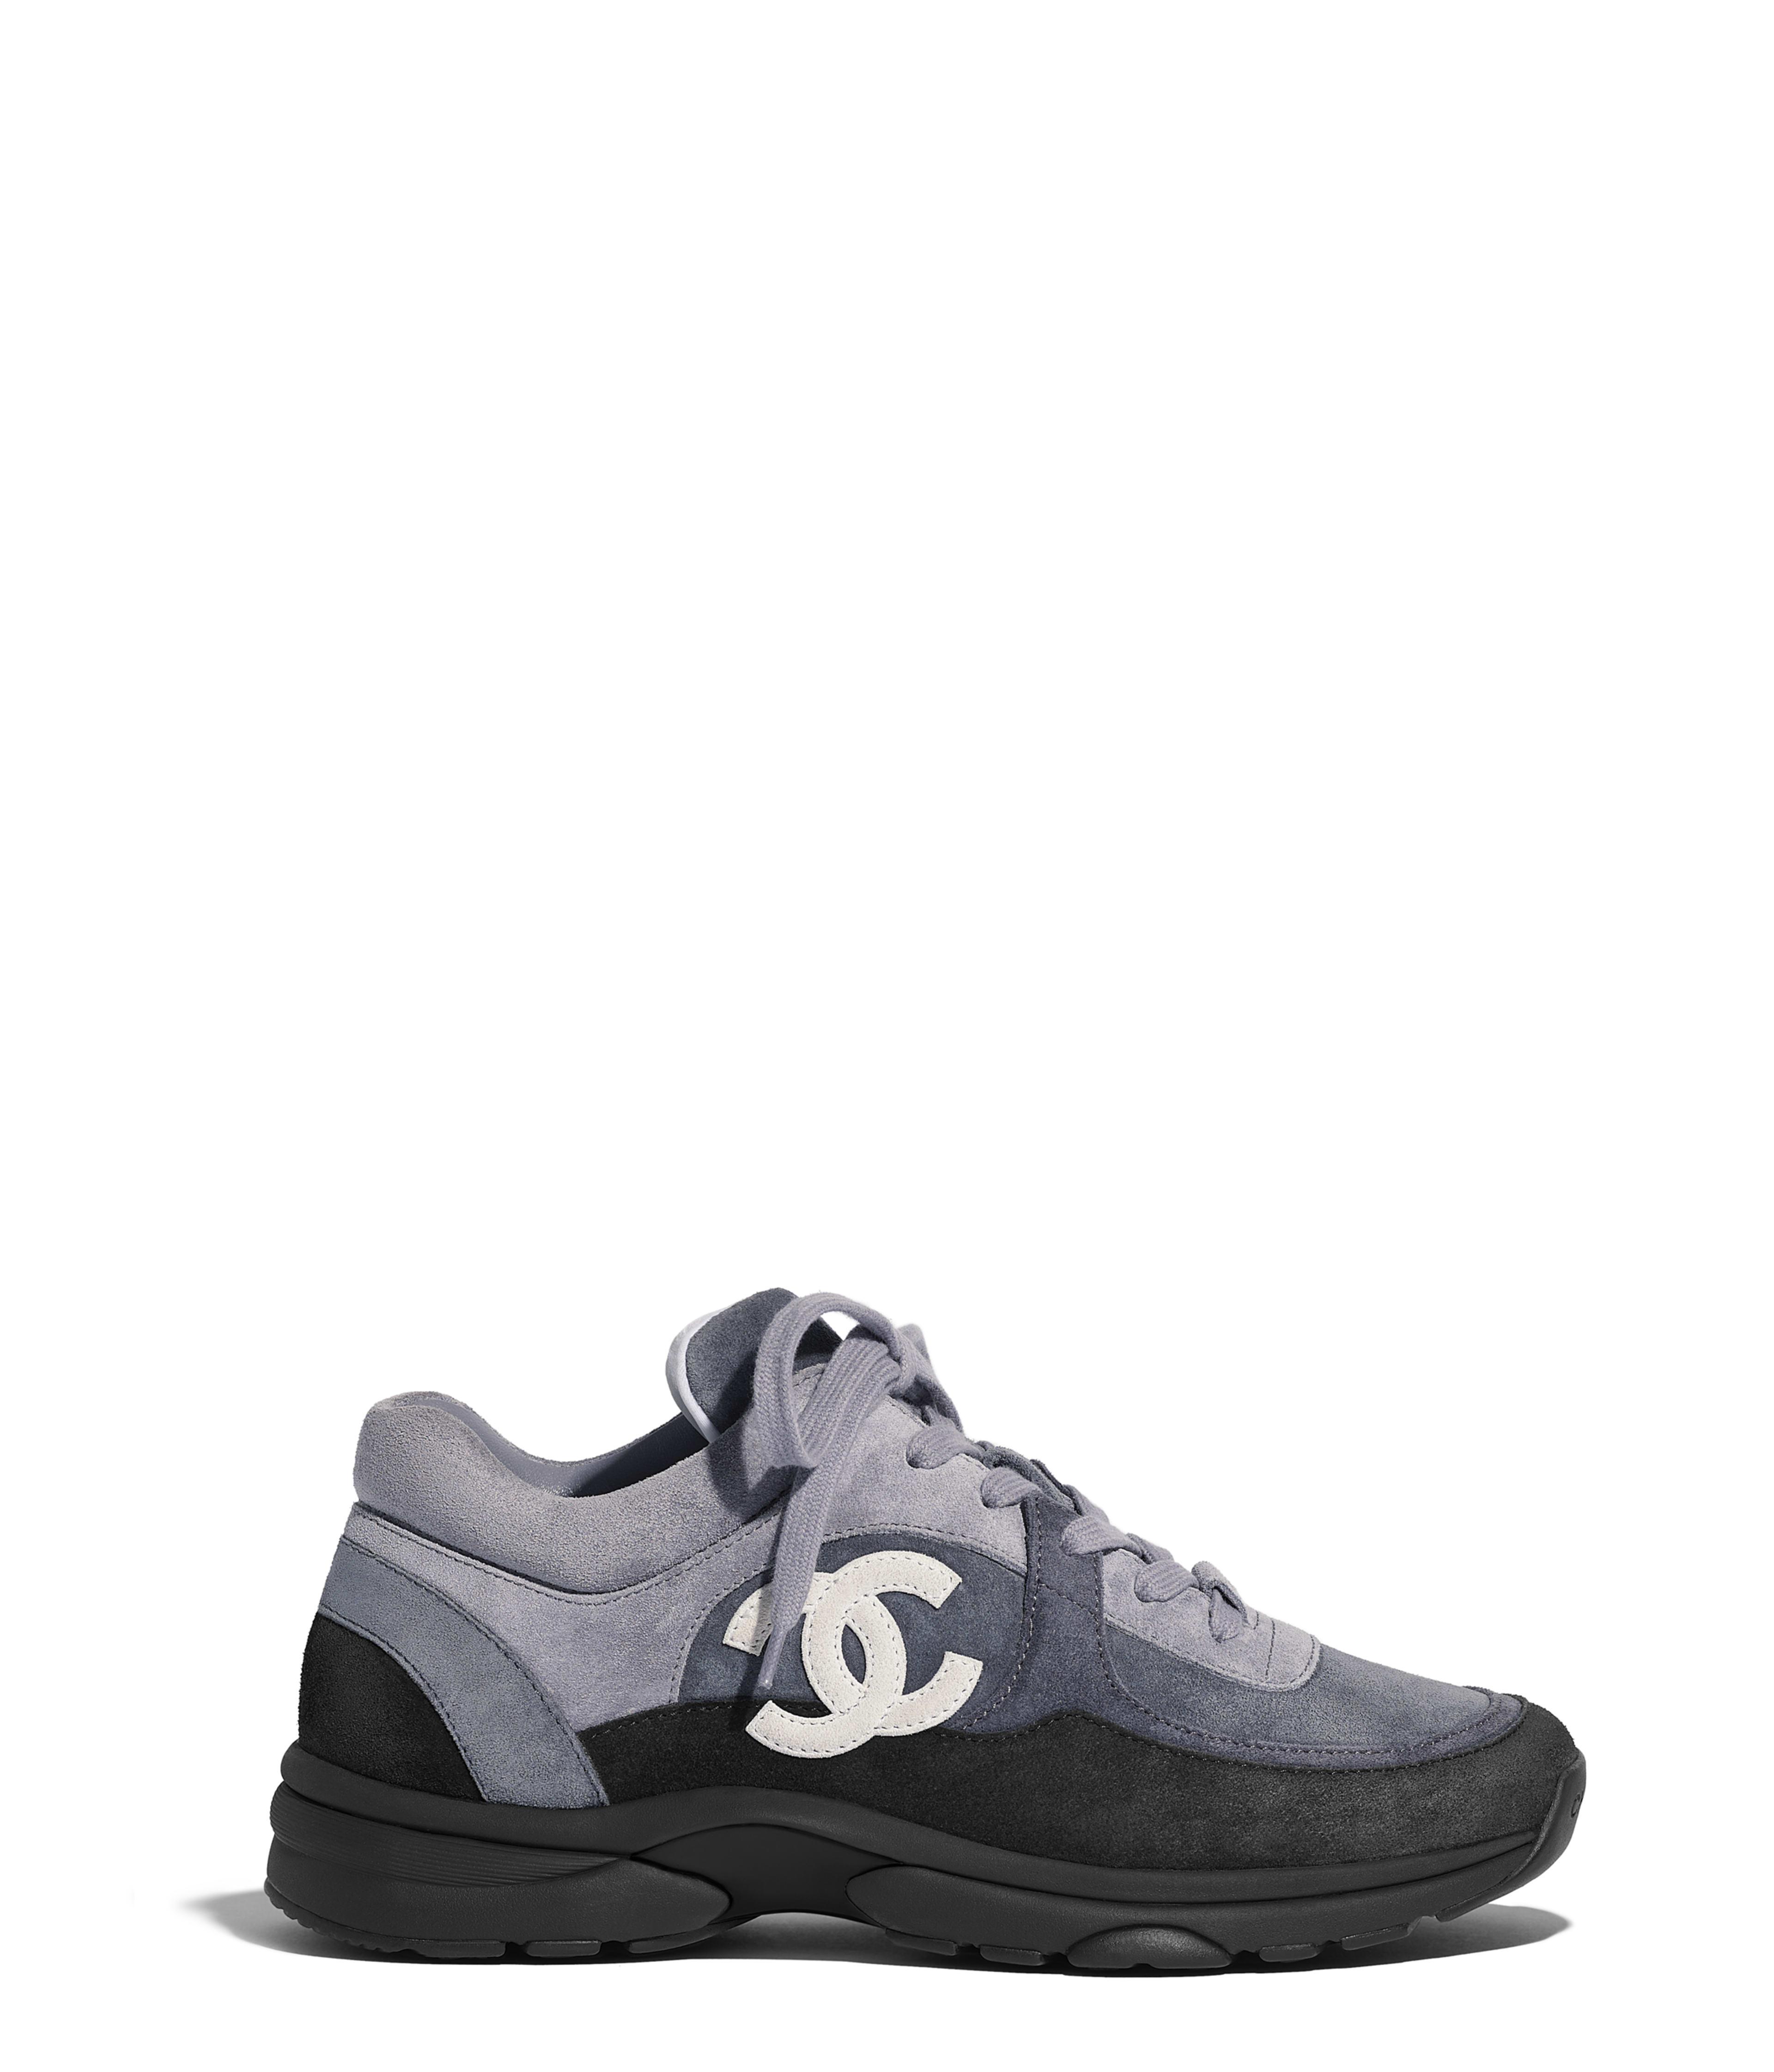 4649b80ef28d5f Sneakers Suede Calfskin